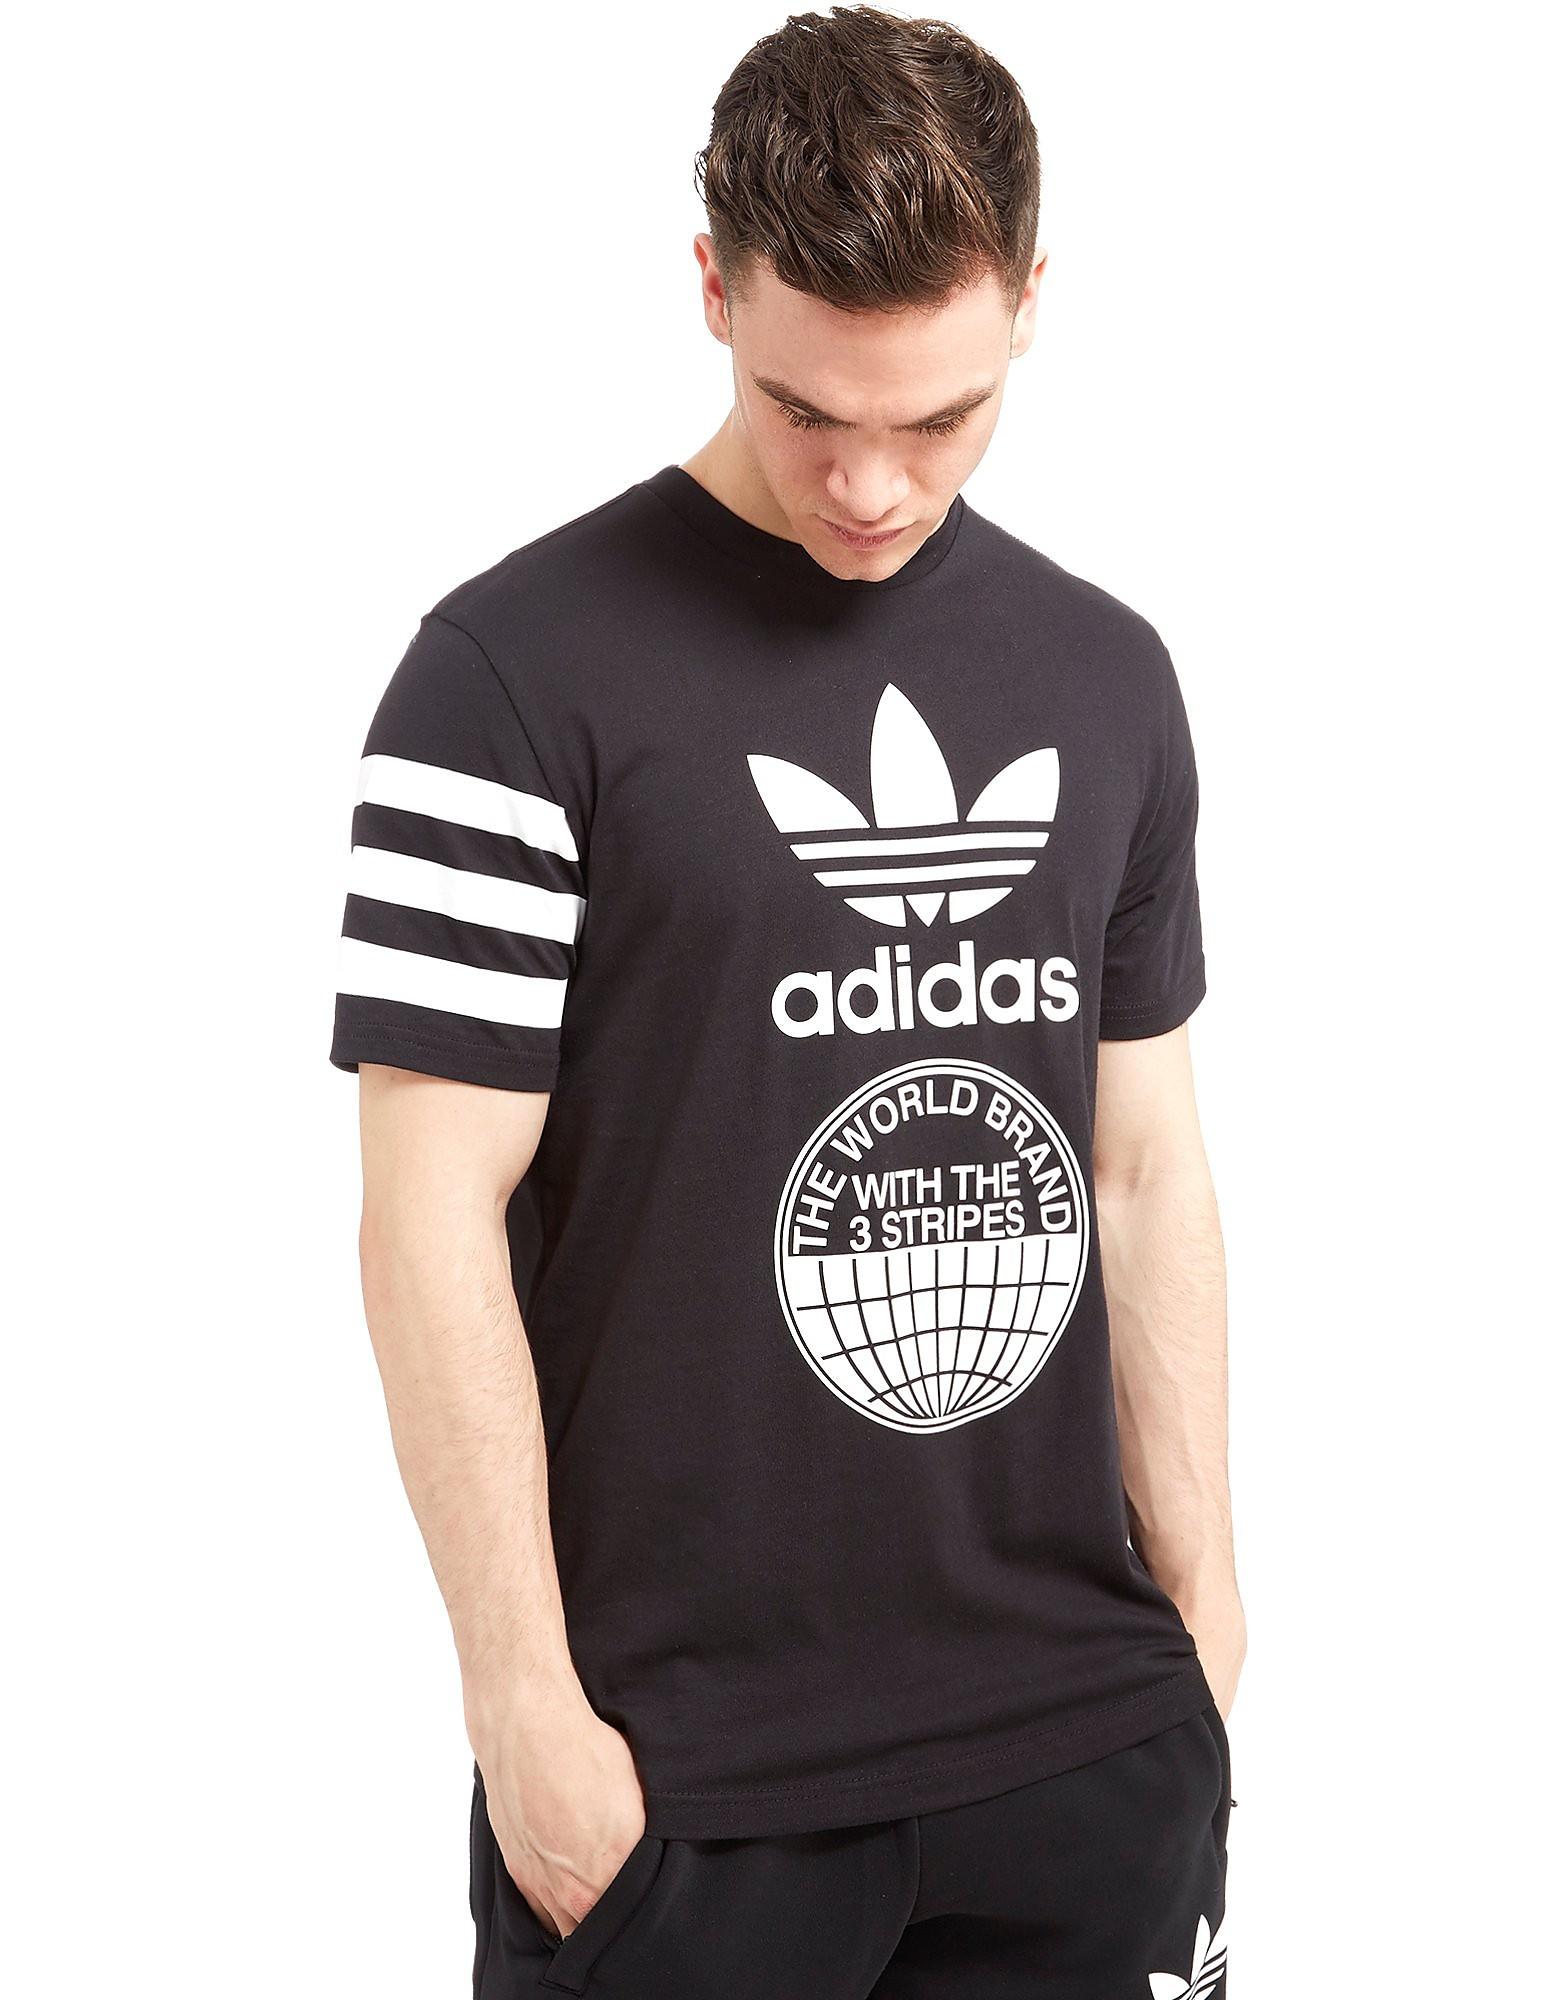 adidas Originals Global T-Shirt